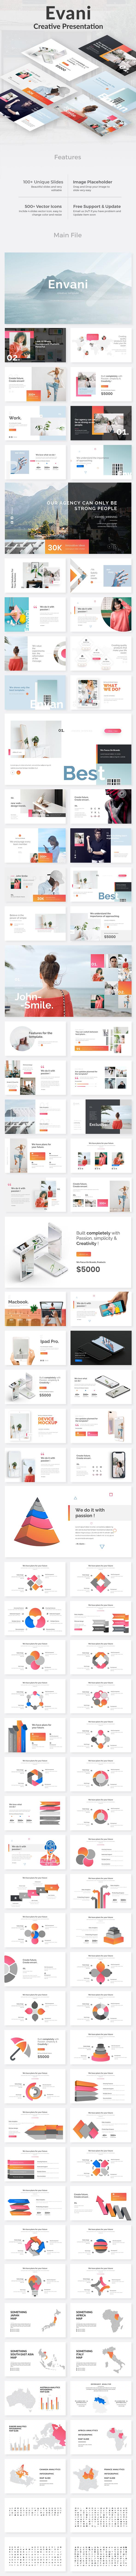 Evani Creative Design Google Slide Template - Google Slides Presentation Templates